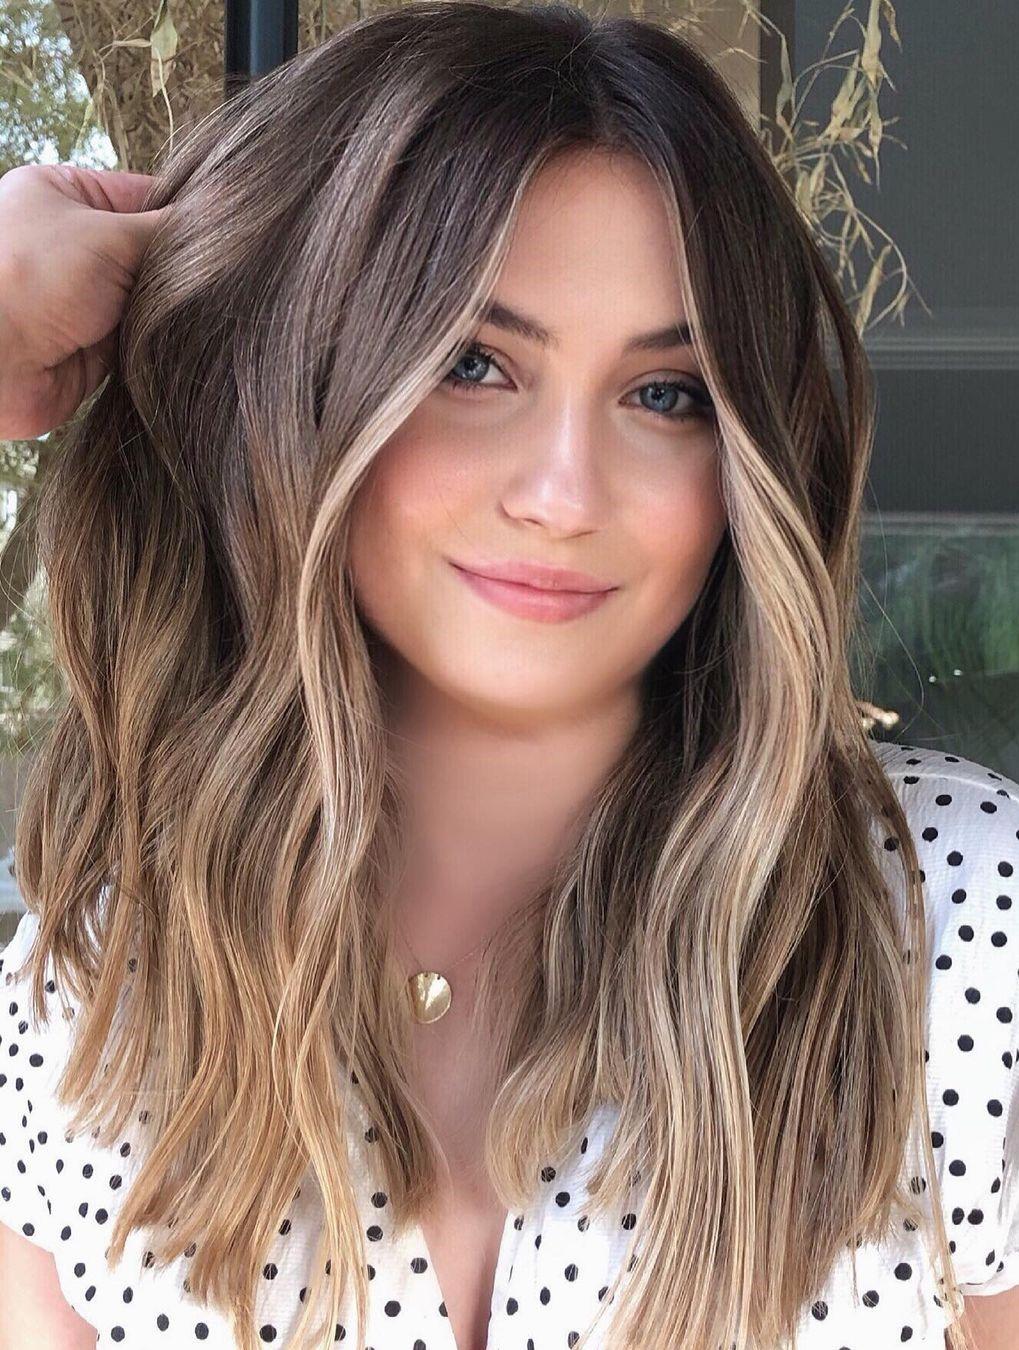 Dark Hairstyle with Golden Highlights